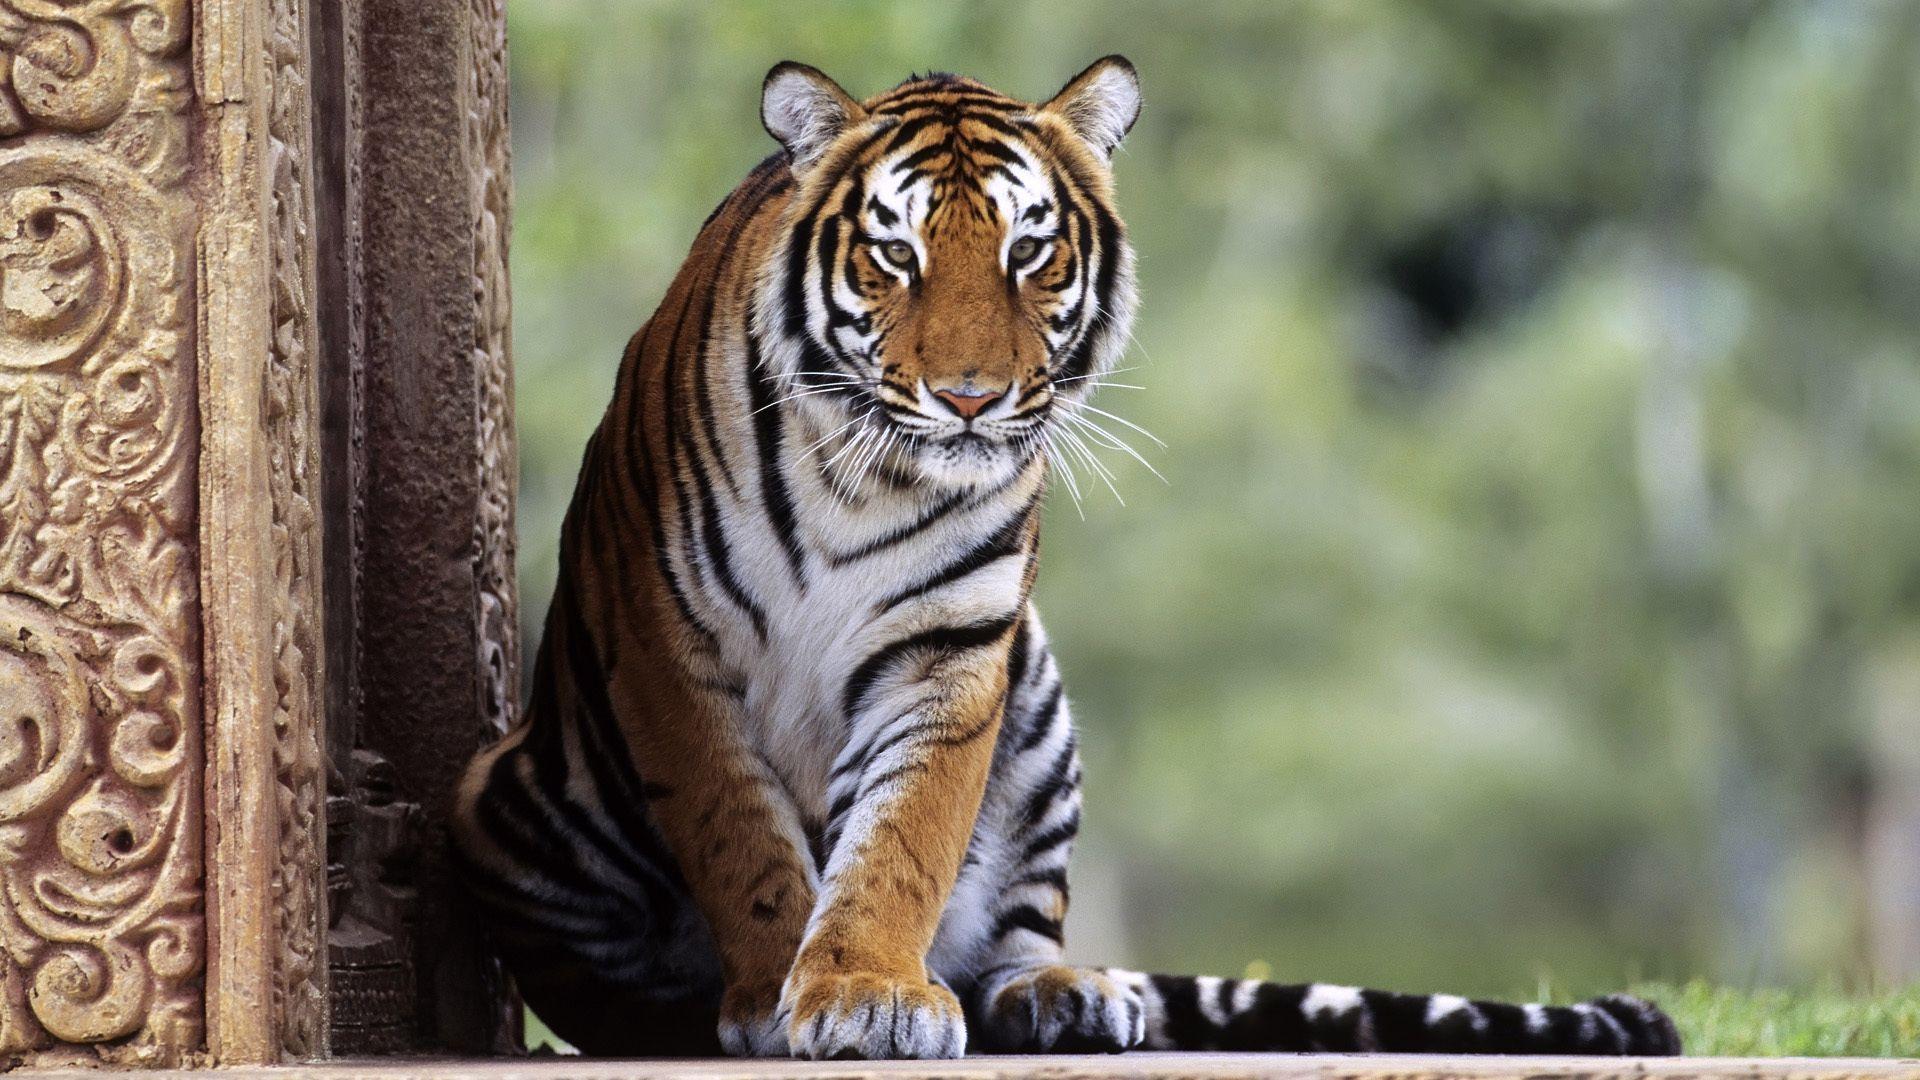 Big Cats Tigers Animals Photo Animal, Tiger Wallpaper Image